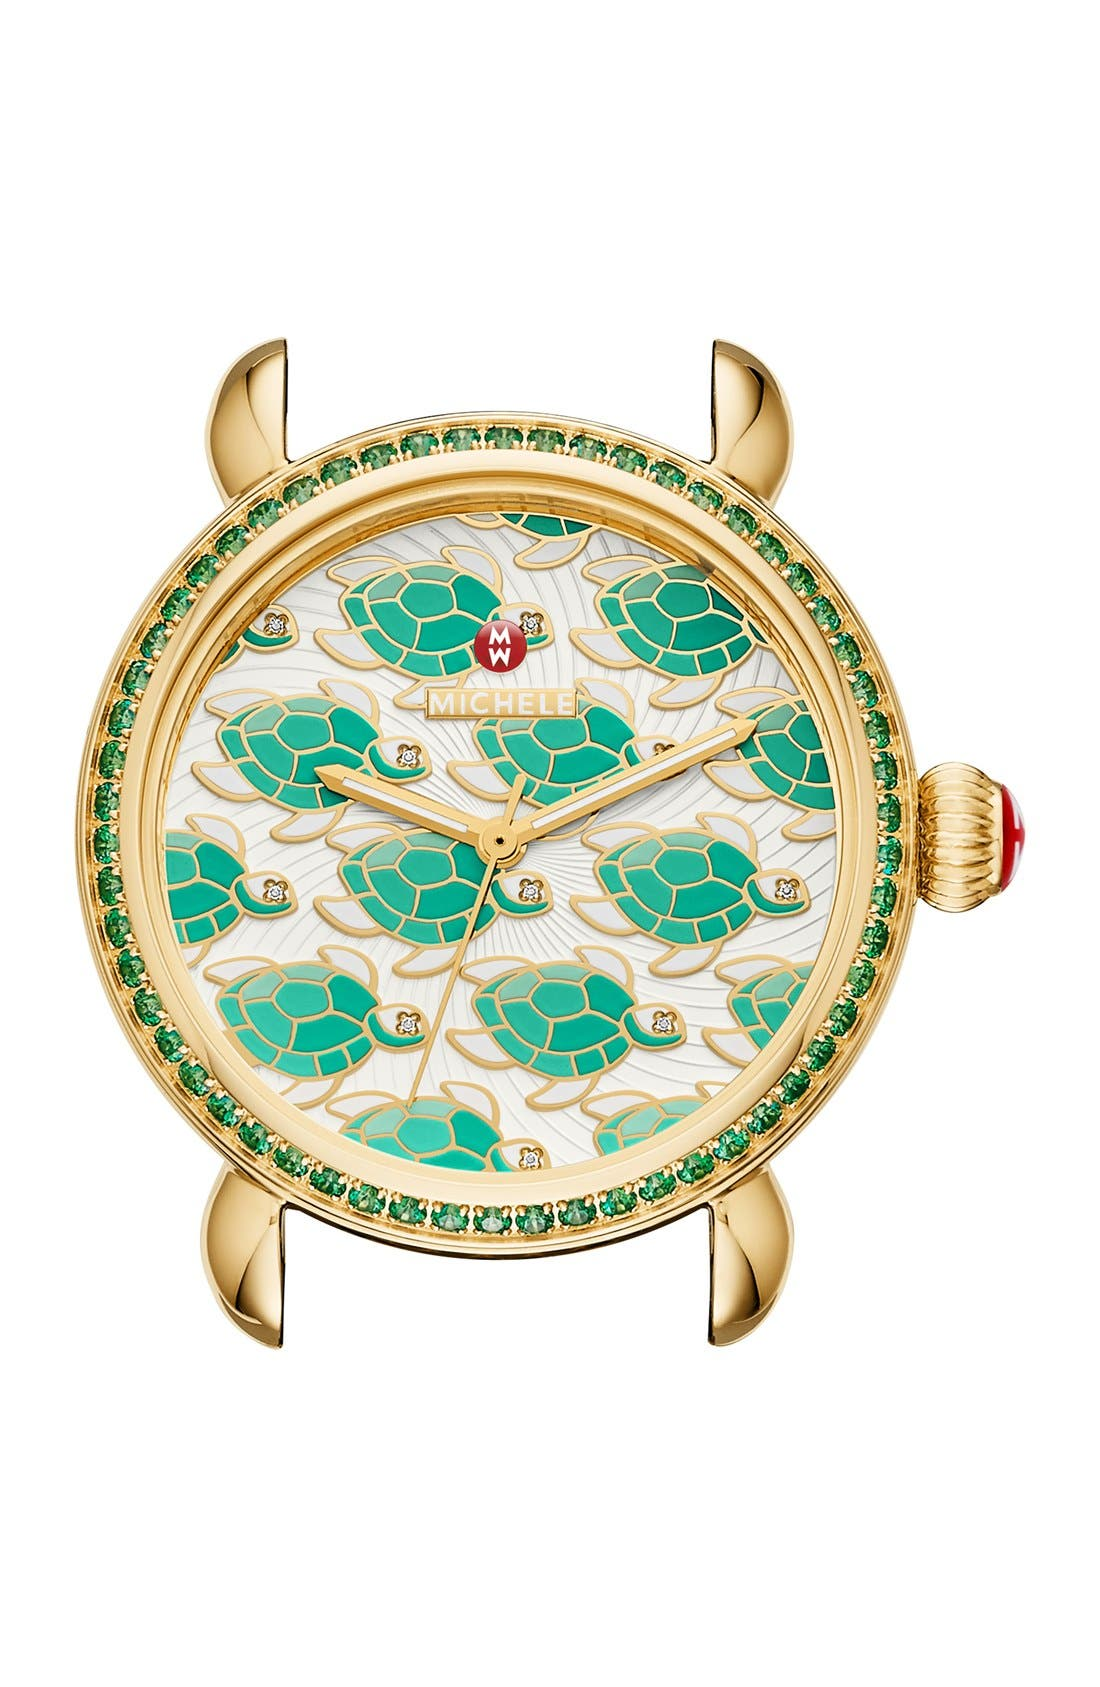 Main Image - MICHELE 'Exotic Creatures' Bracelet Watch Case, 36mm